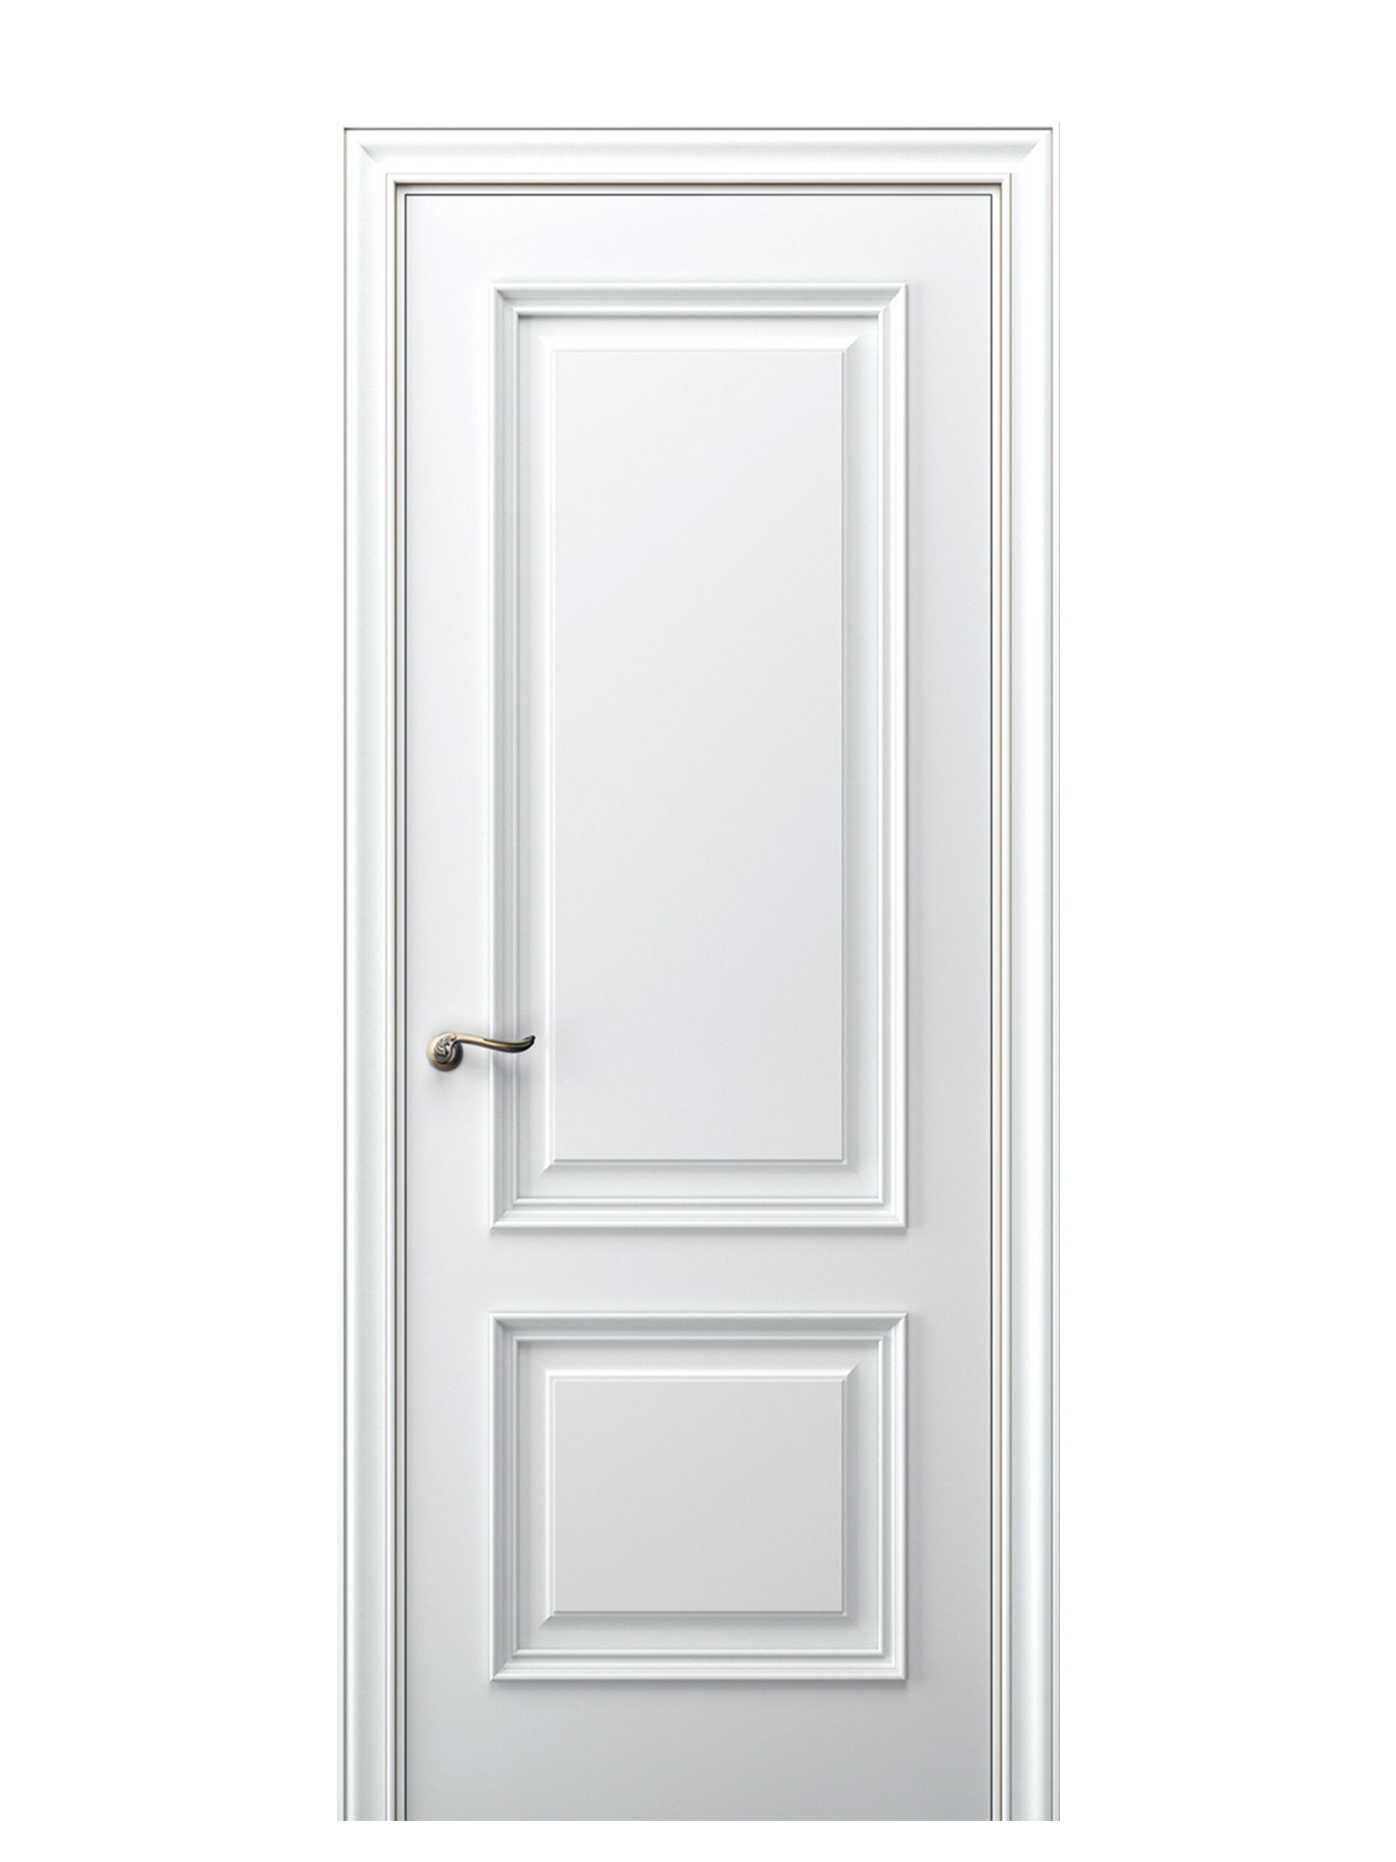 Image Nola Interior Door Italian Enamel White 0